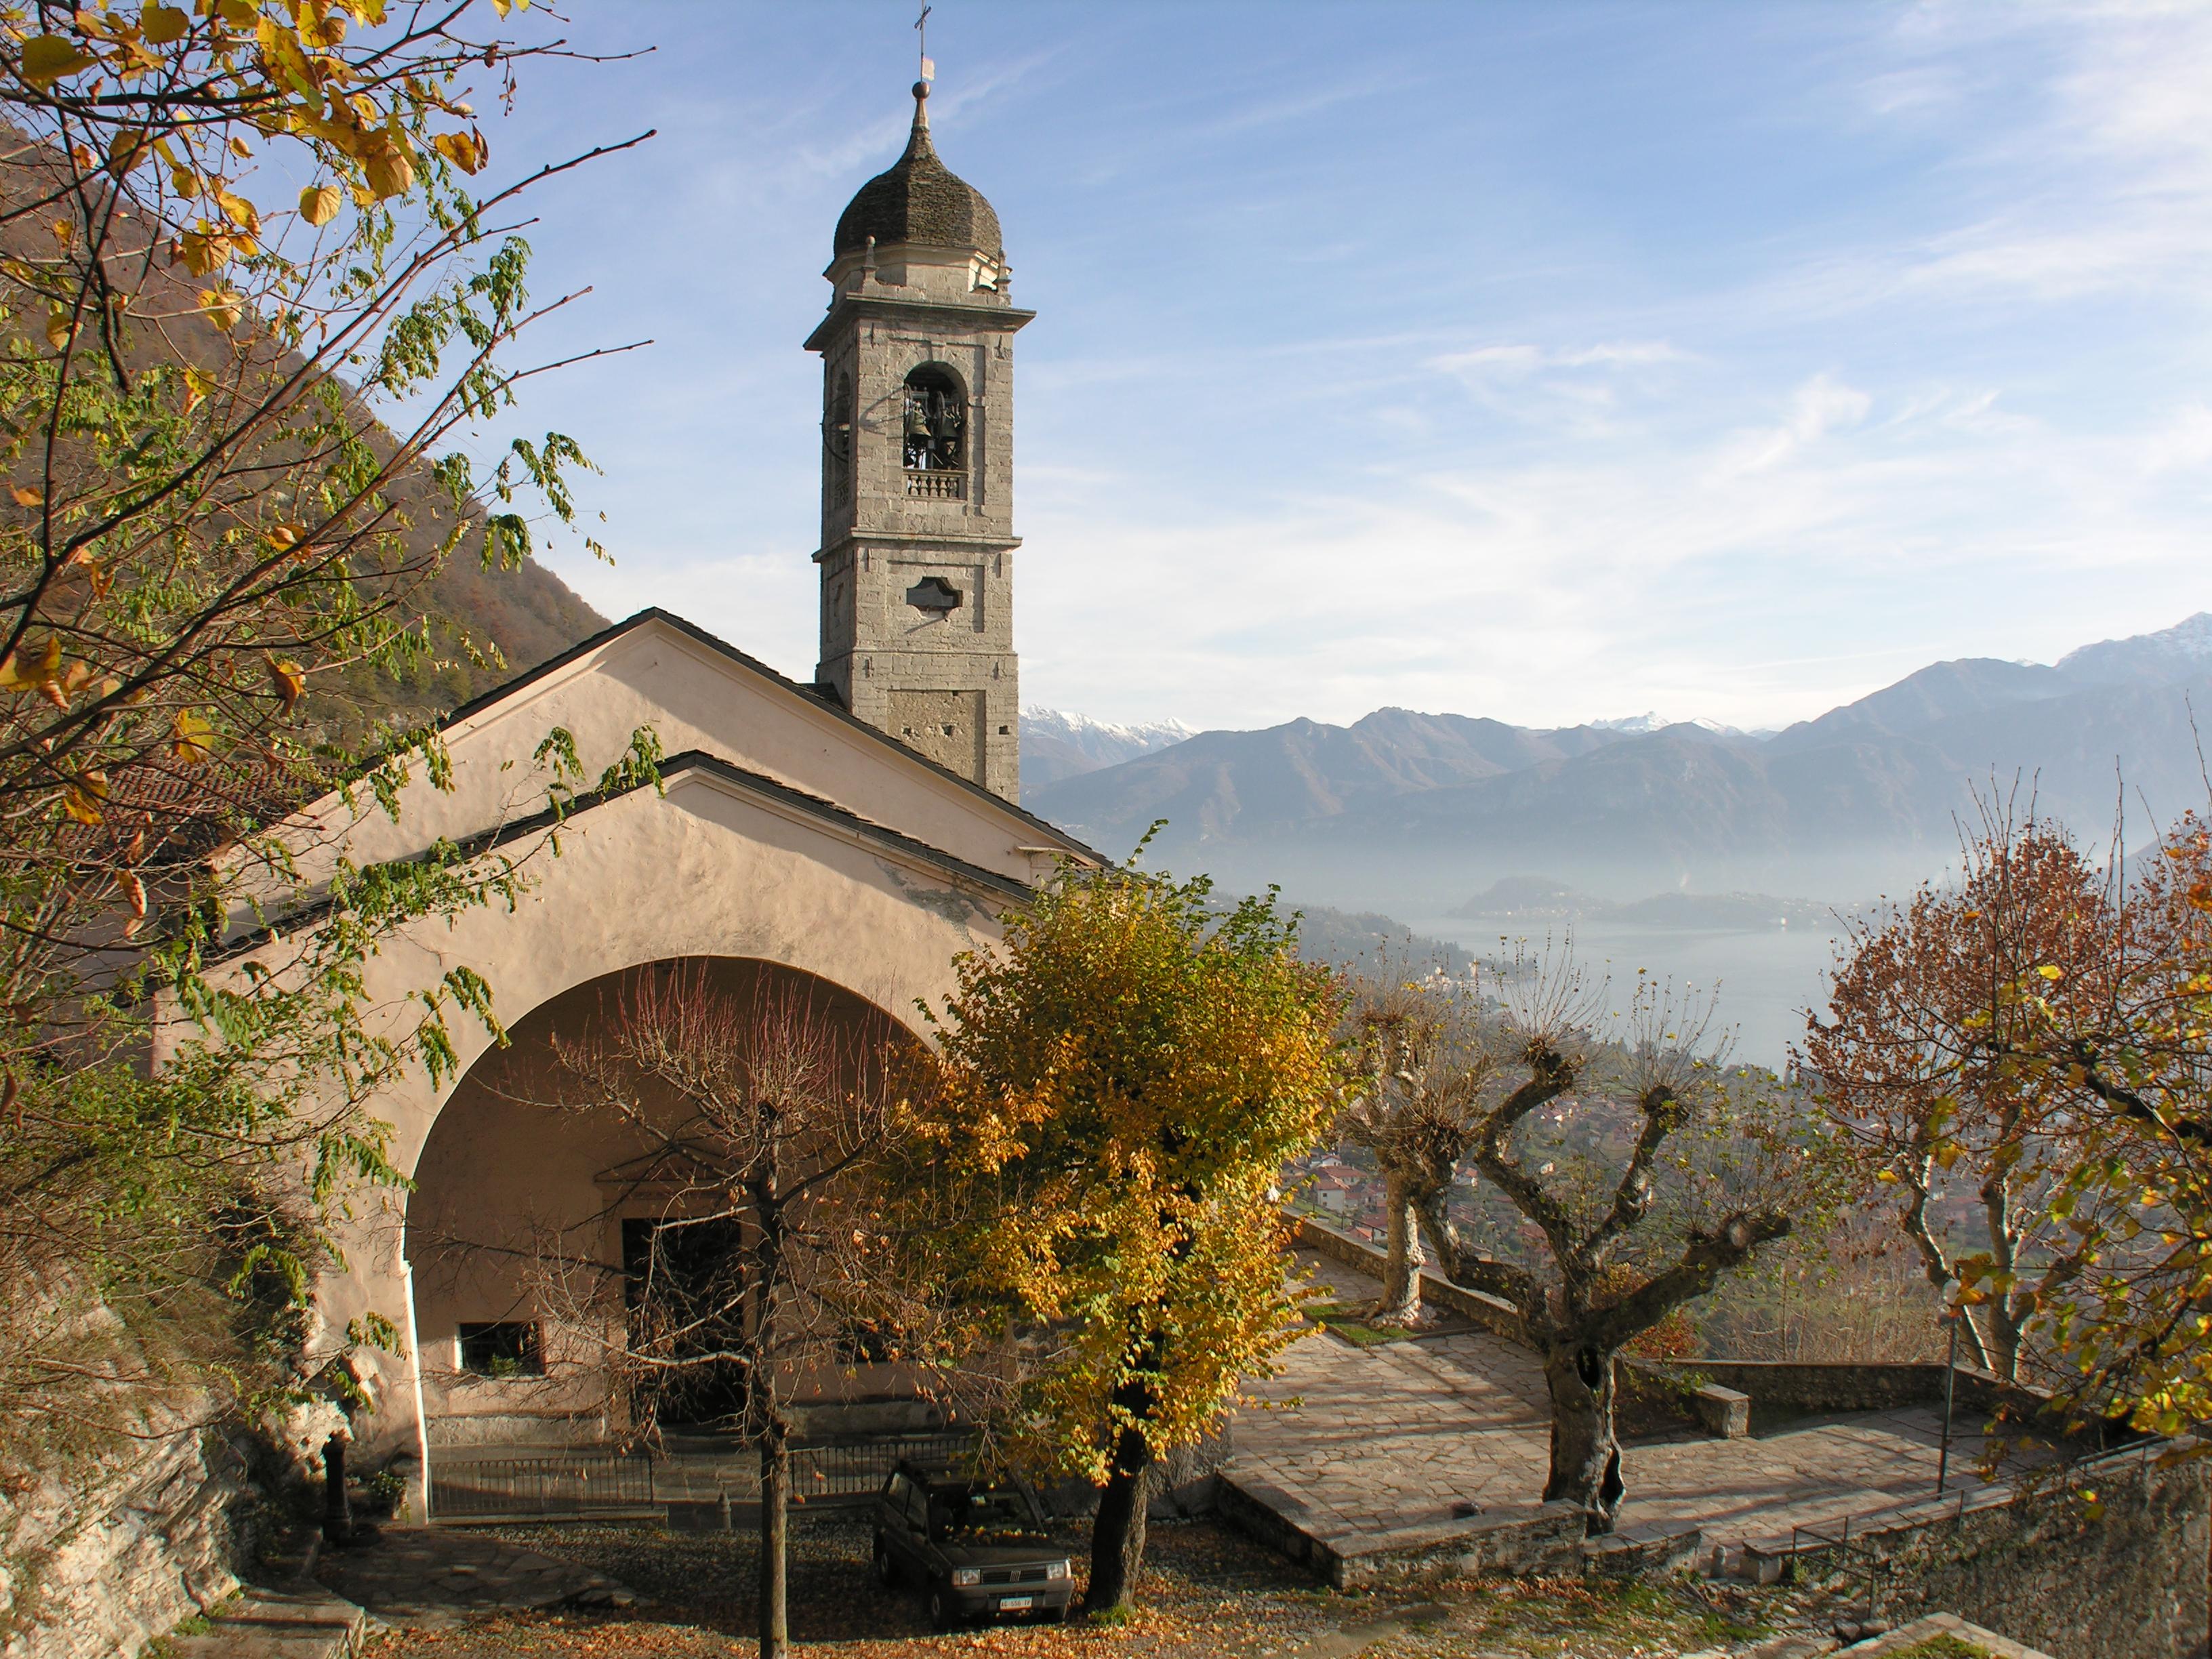 Sacro Monte dii Ossuccio (Tremezzina-CO)